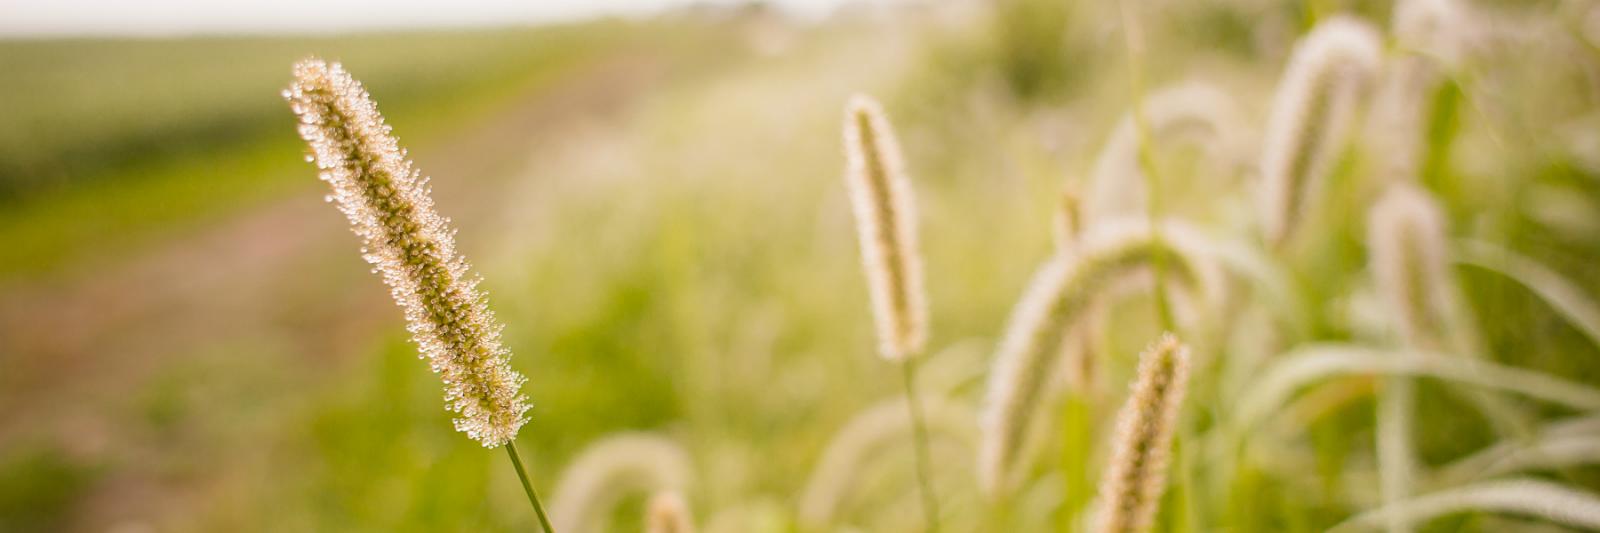 ttf-wheat.jpg